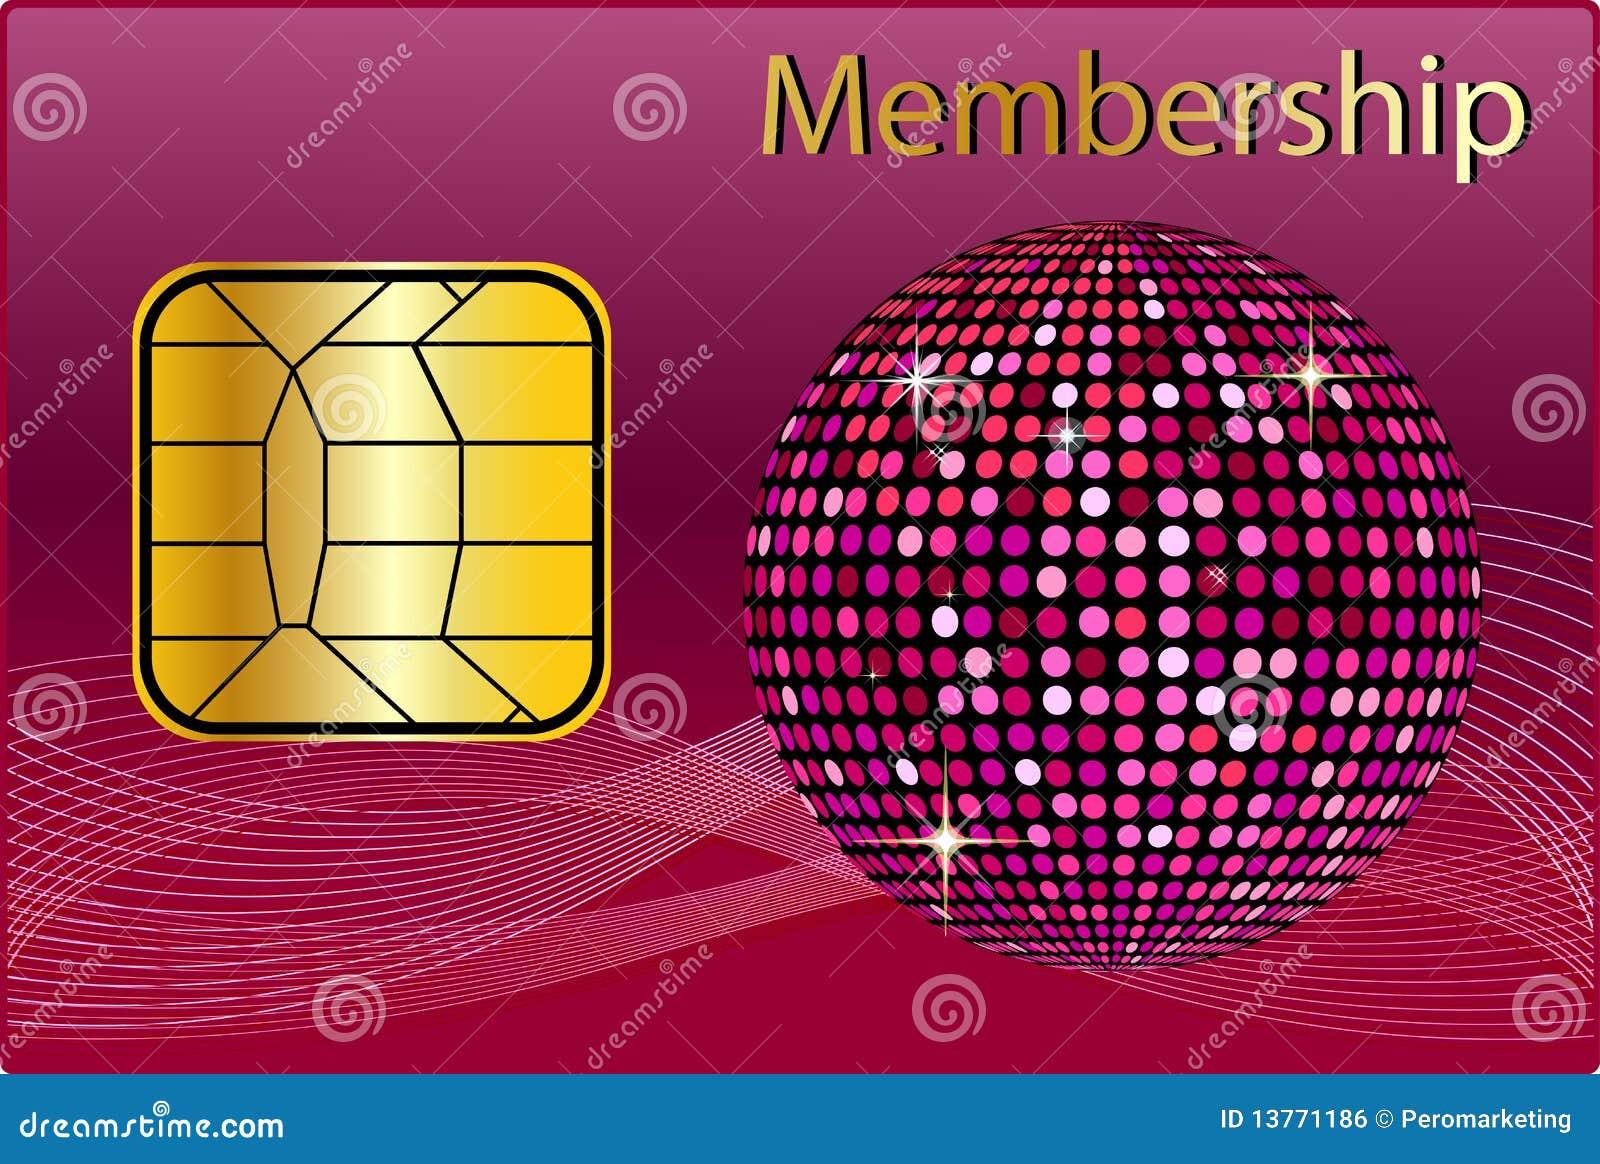 membership card royalty free stock image